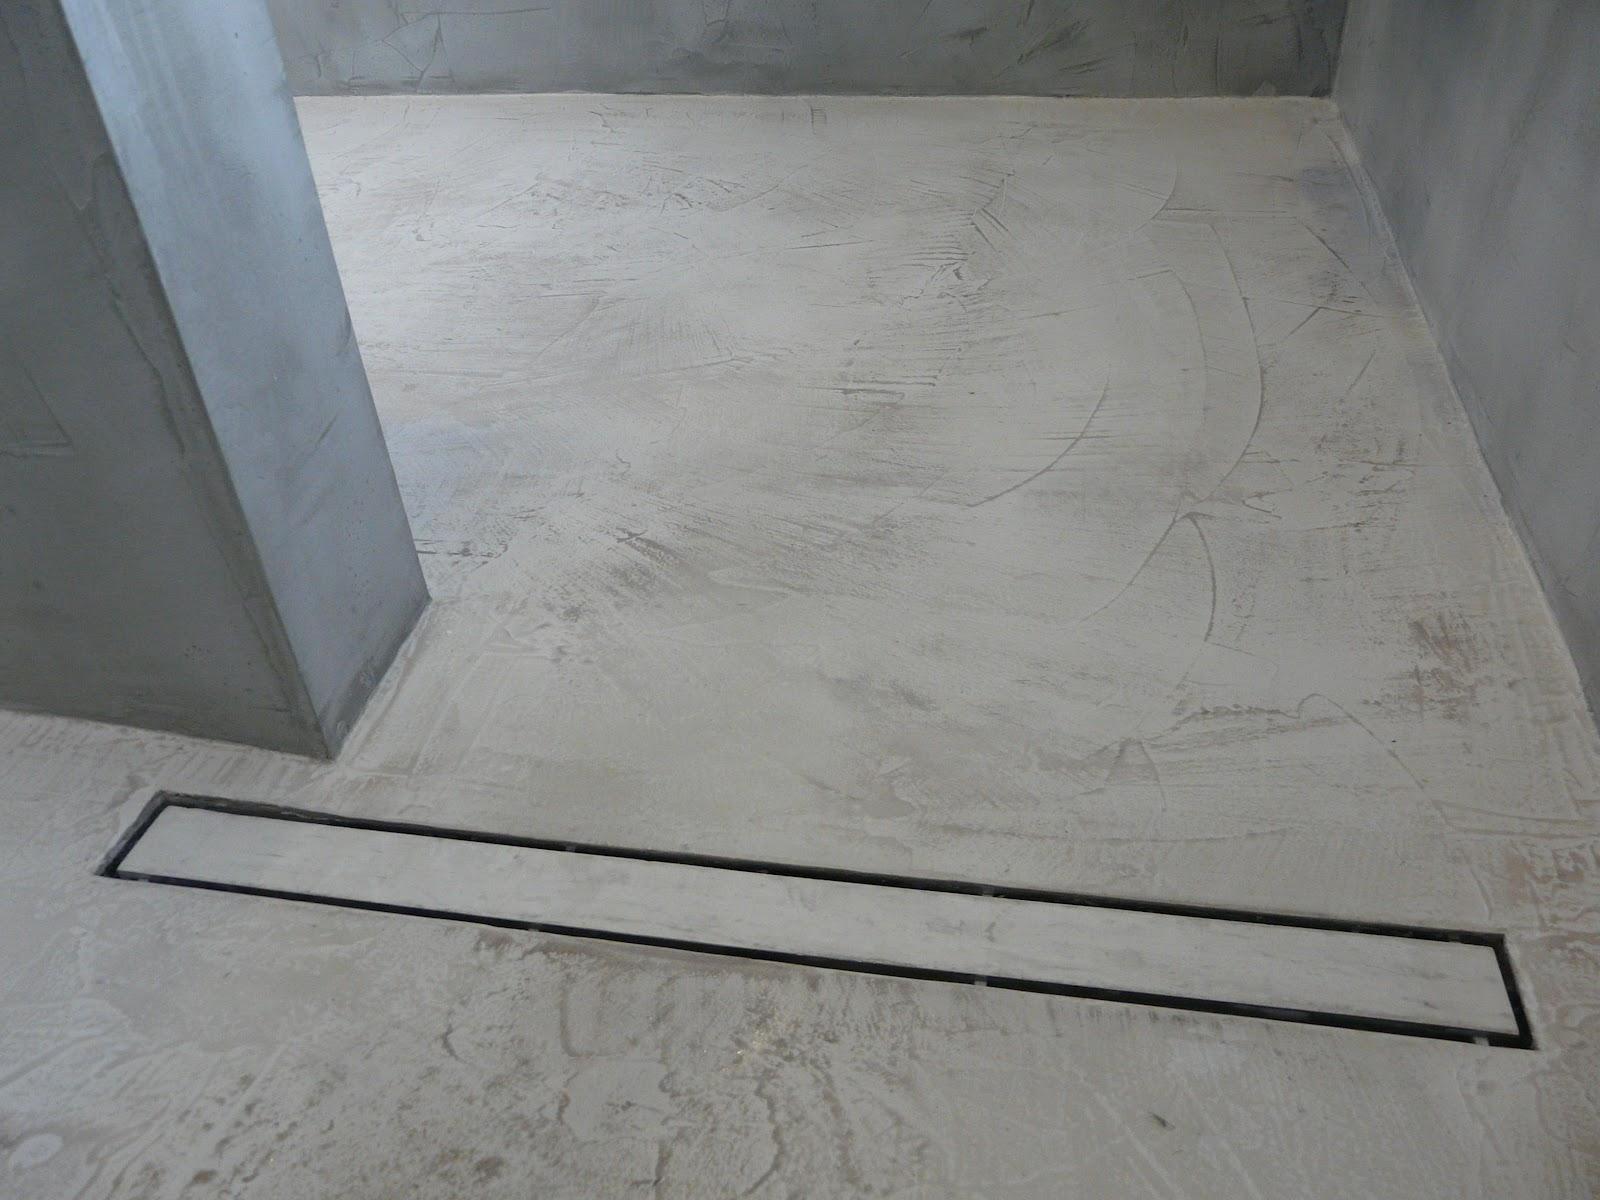 wand wohndesign beton cire september 2012. Black Bedroom Furniture Sets. Home Design Ideas